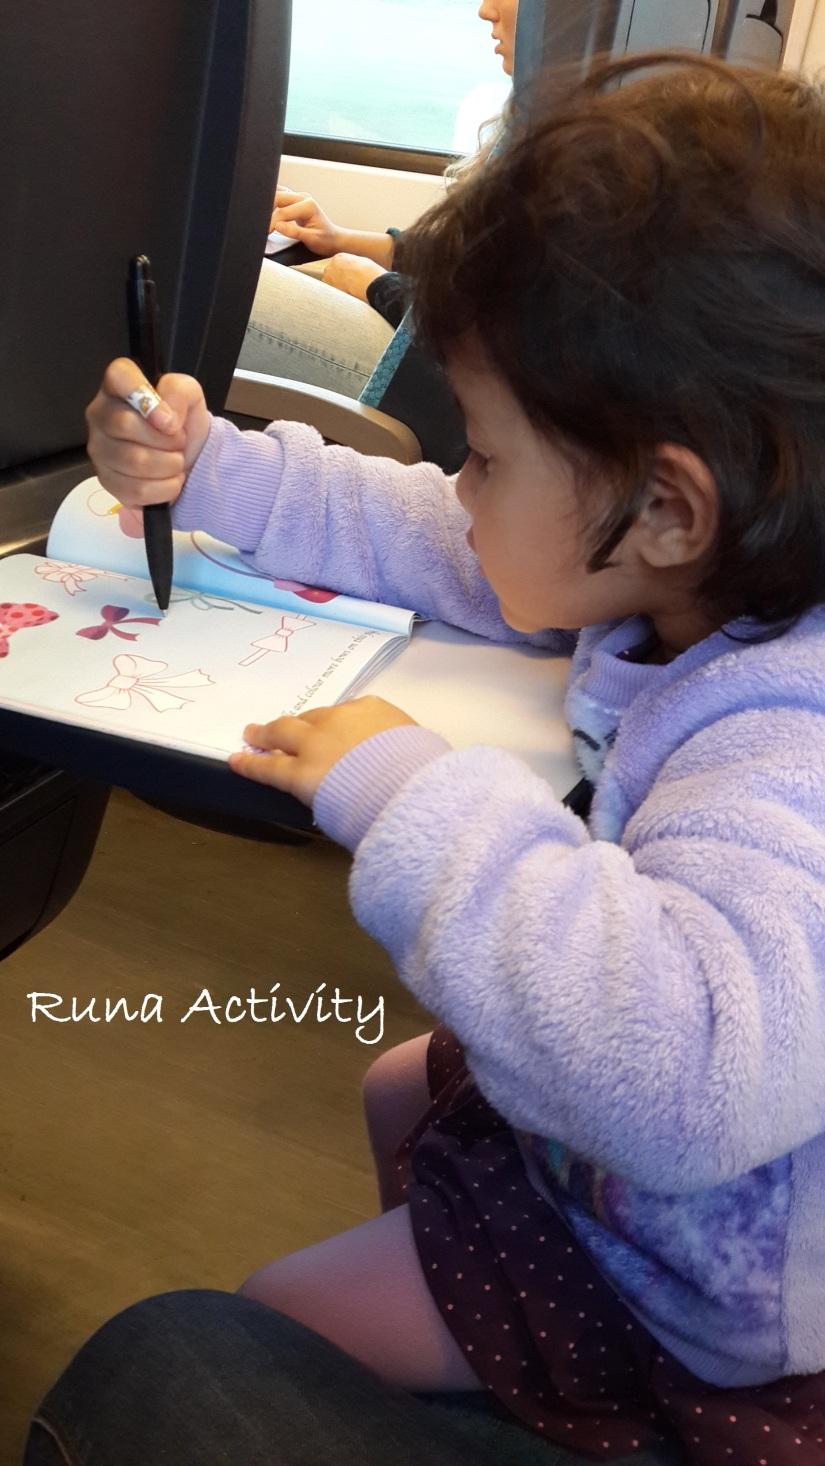 Runa activity